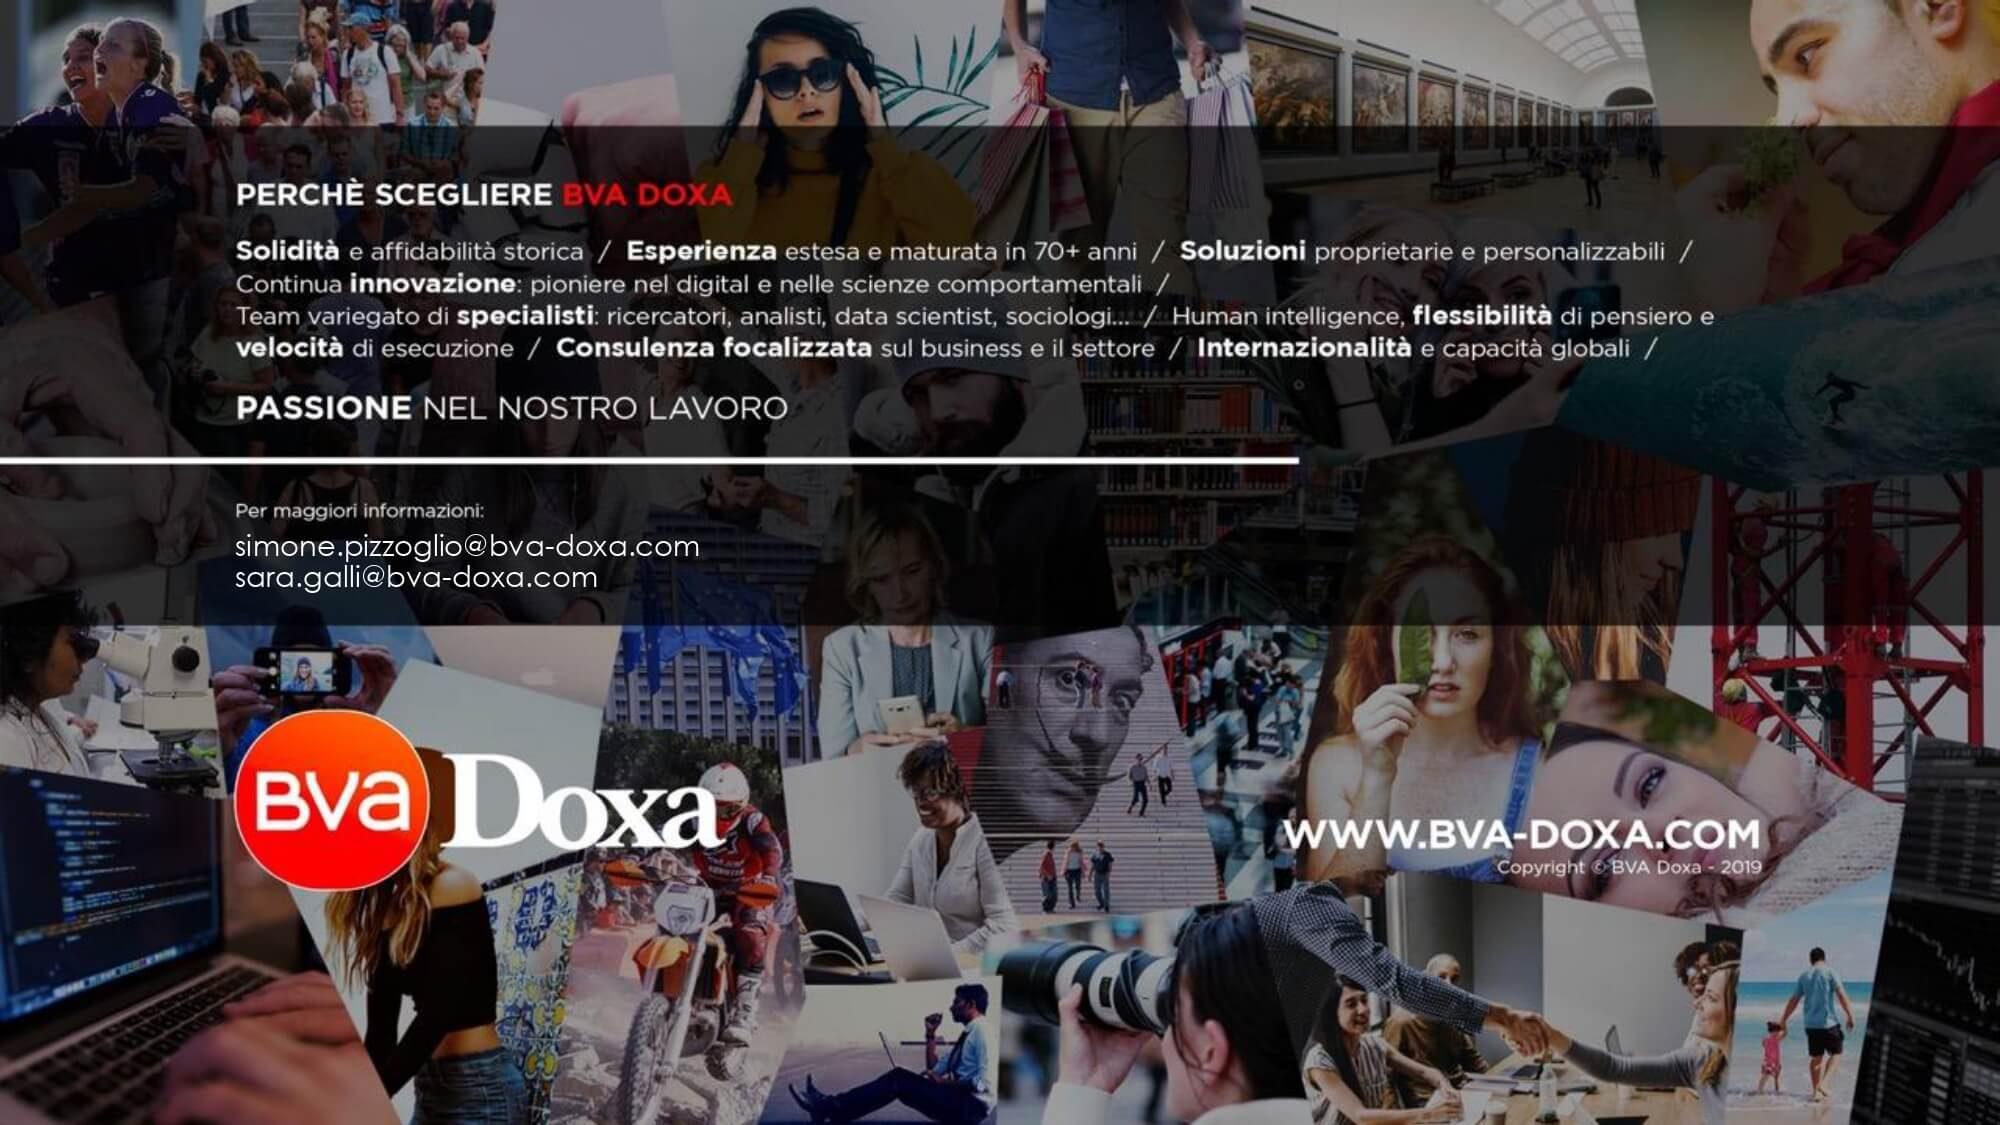 Bva Doxa Banking & Insurance Esg & Reputation Page 0031